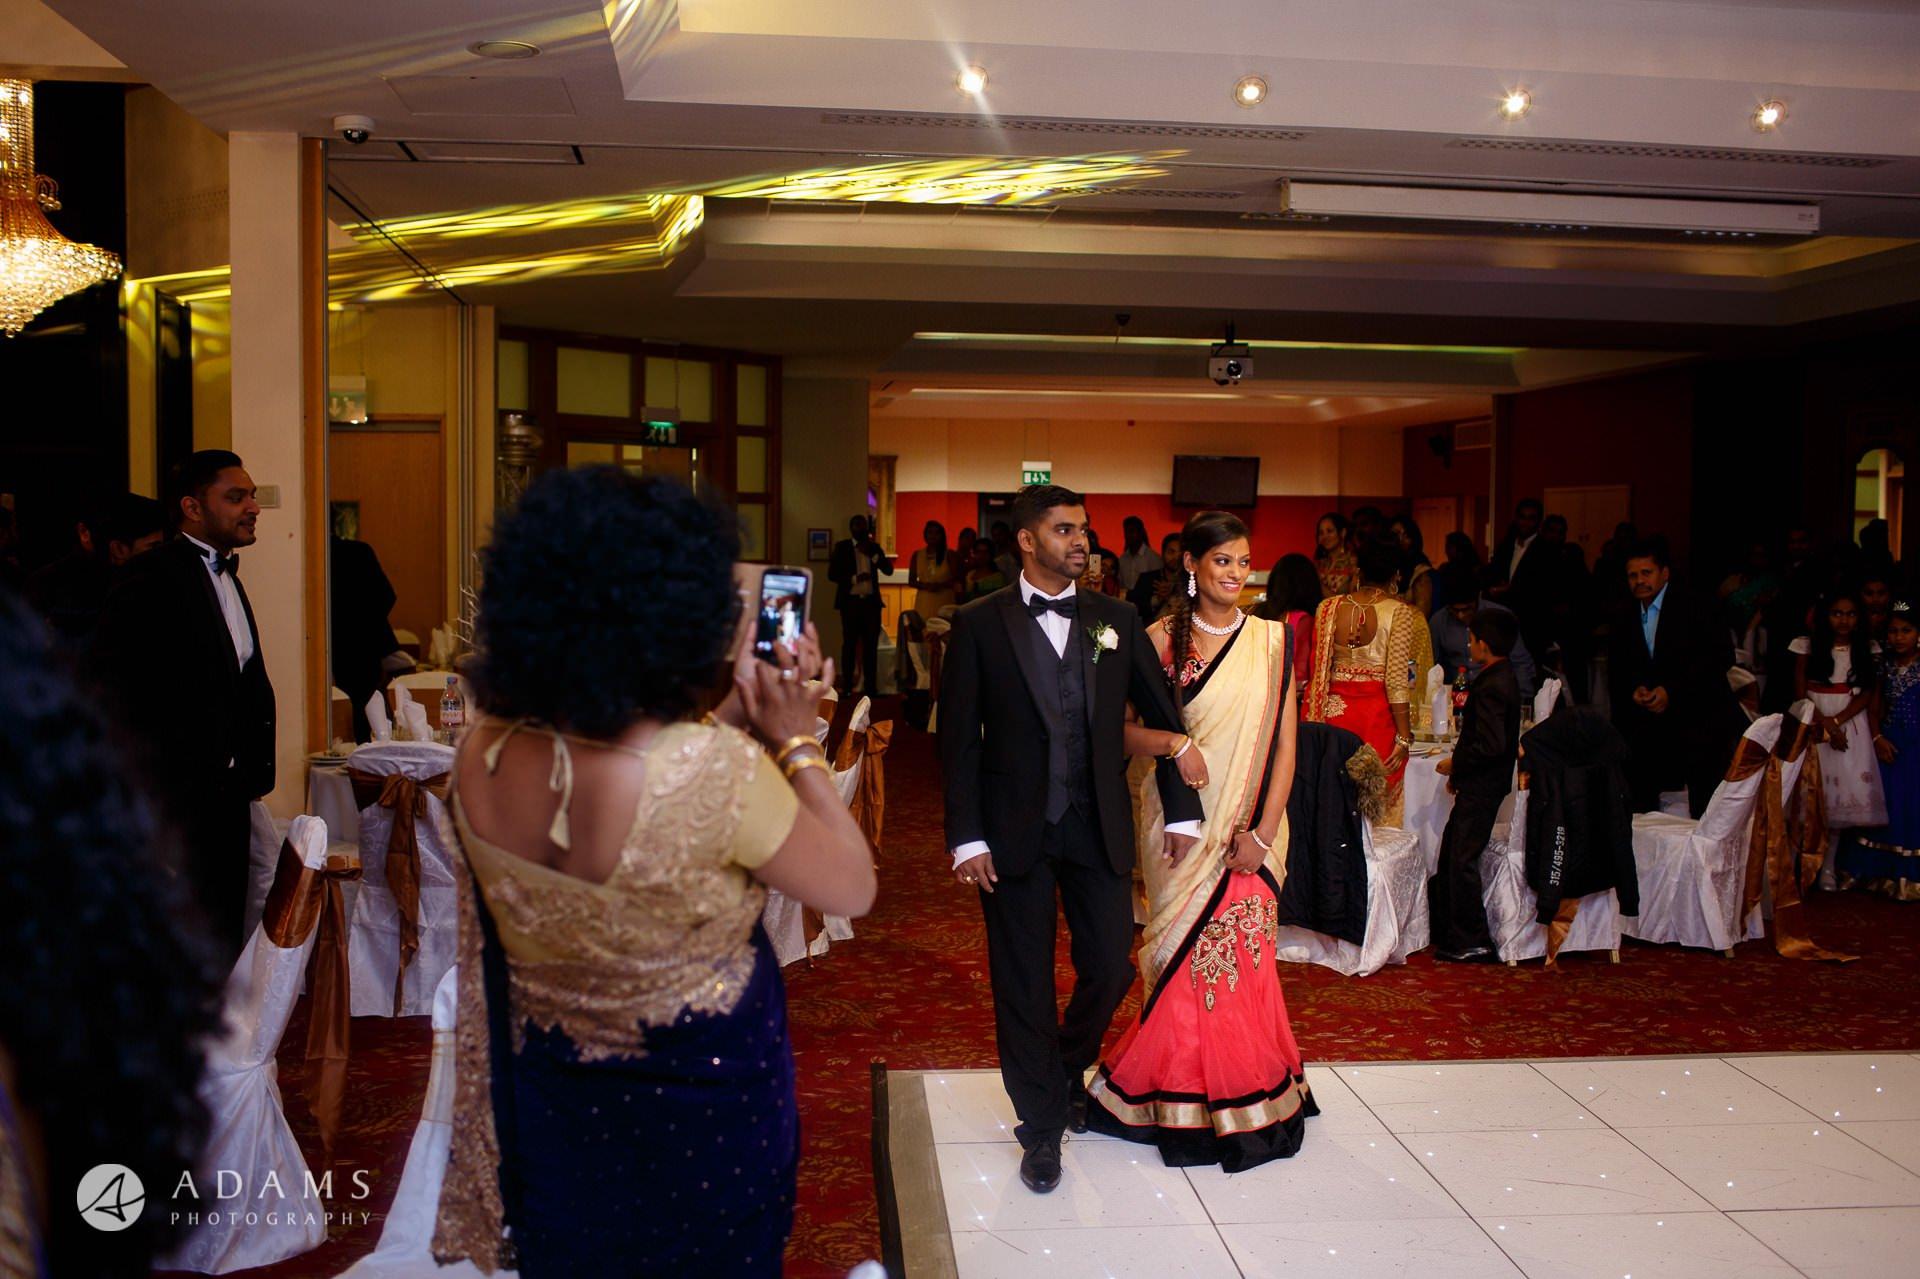 Baylis House Wedding Photographer | Sara + Anojan 21